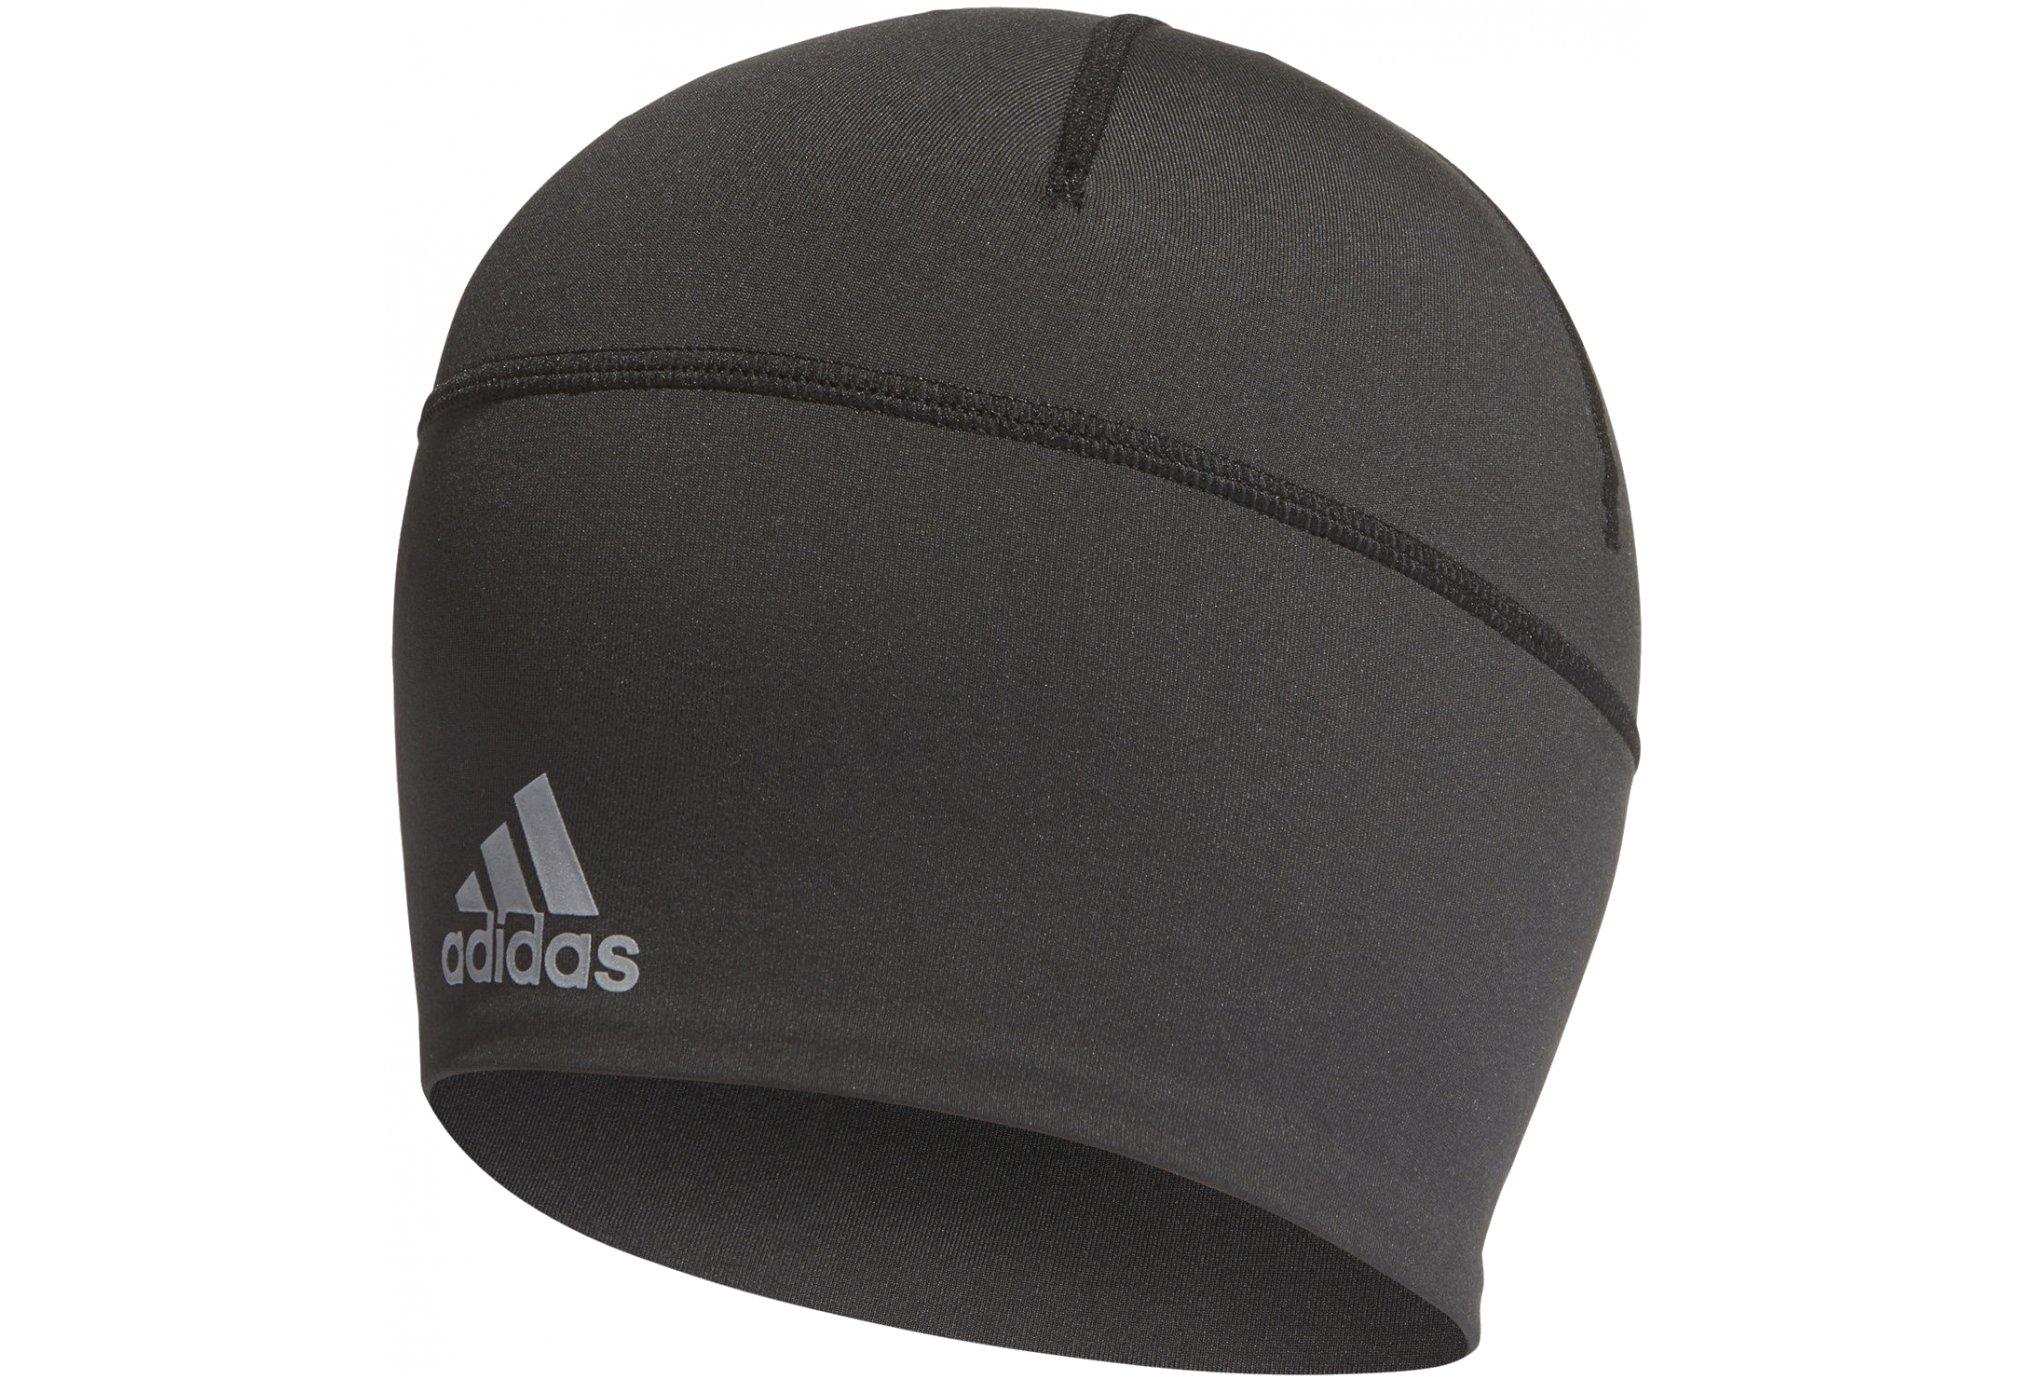 adidas Climalite M Bonnets / Gants